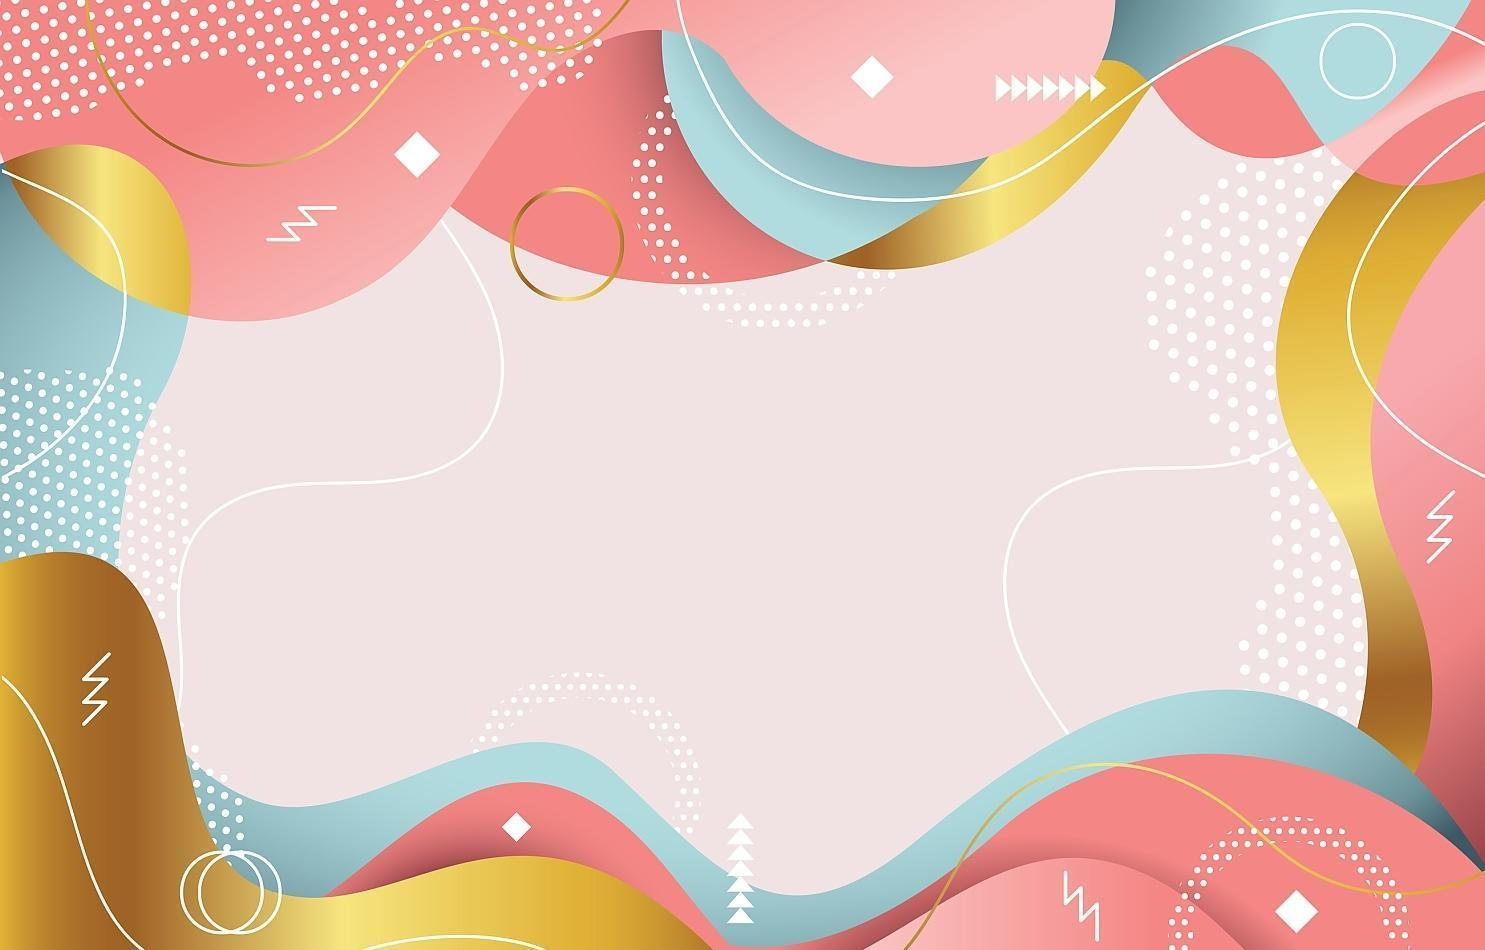 zacht gekleurde platte abstracte Memphis achtergrond vector